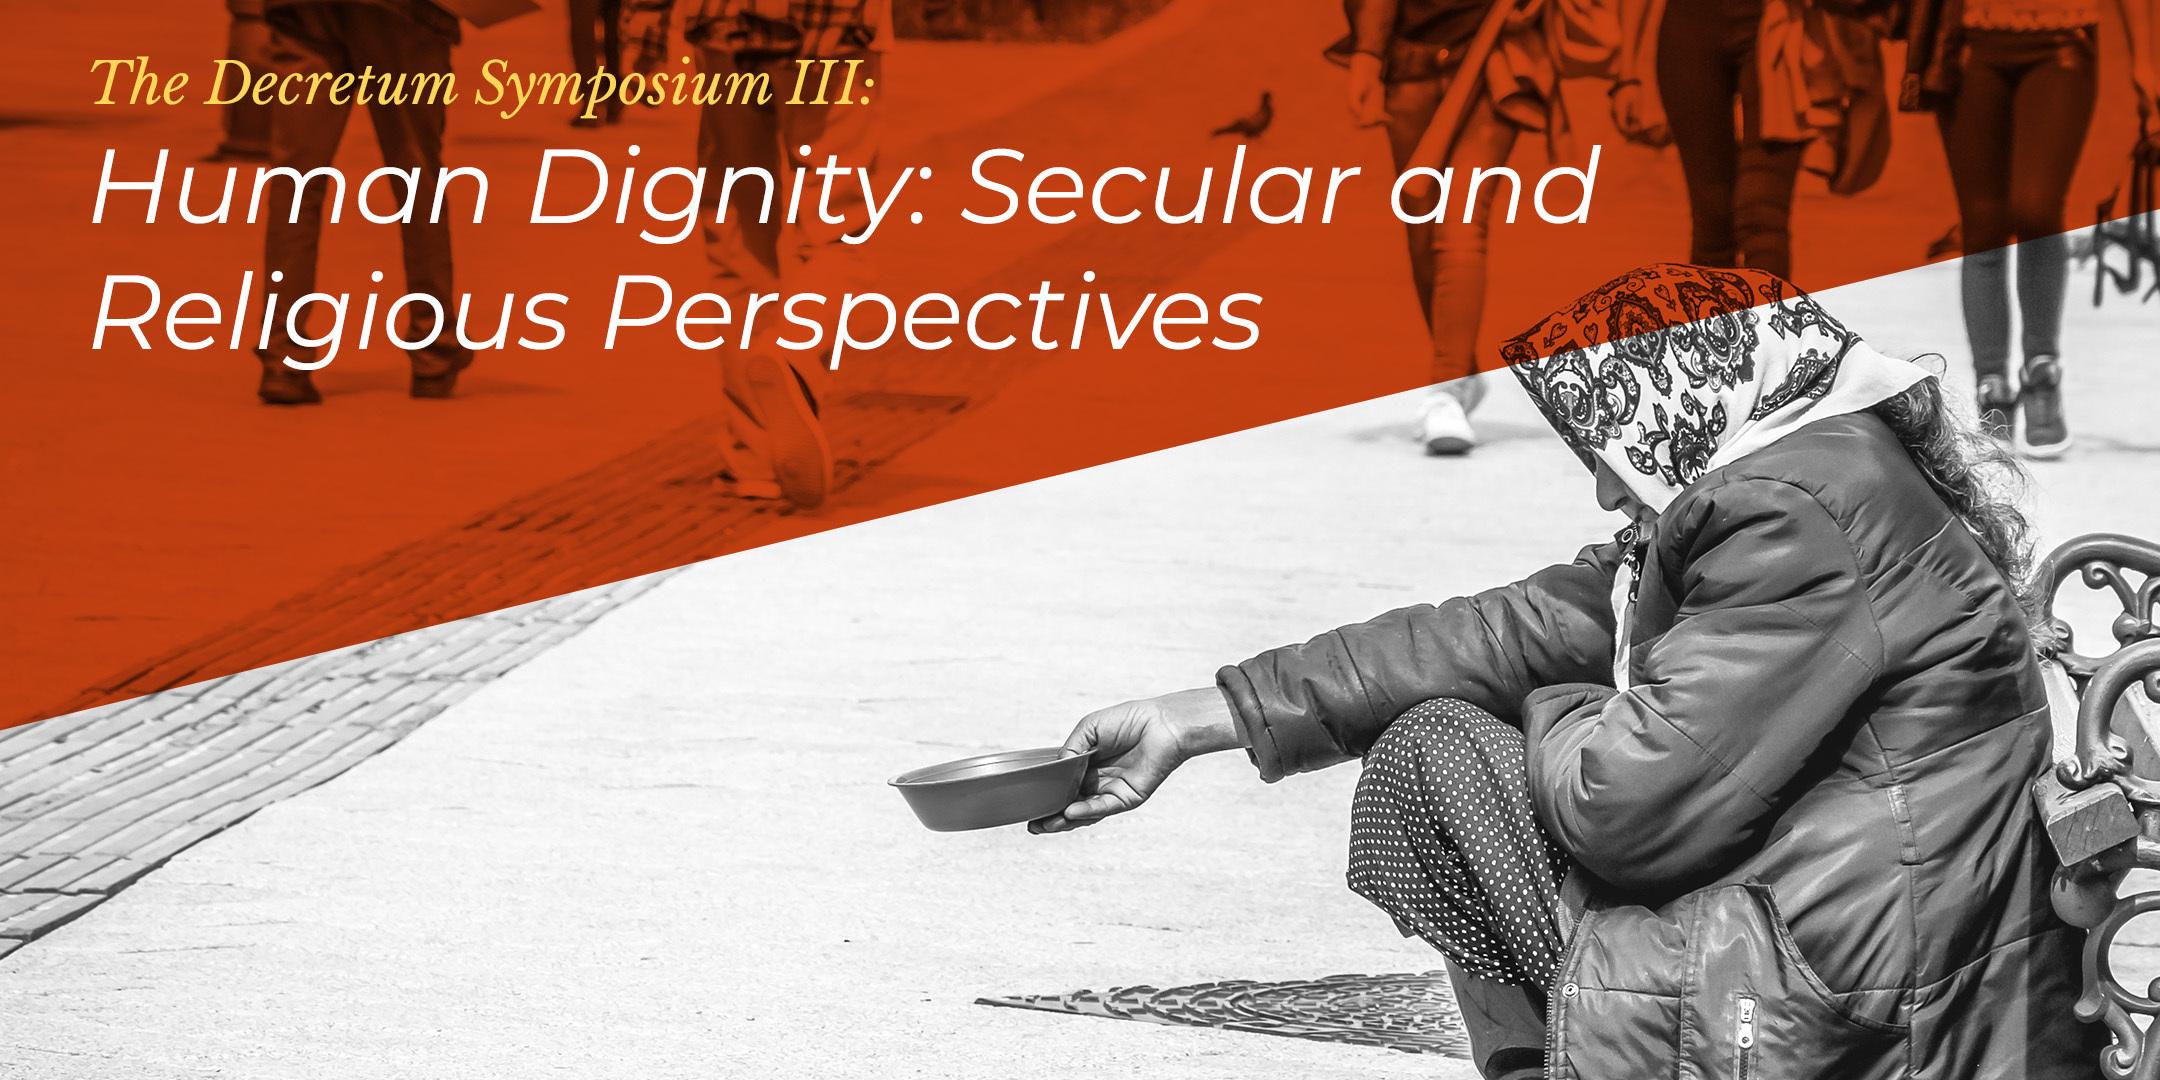 Decretum Symposium III - Human Dignity: Secular and Religious Perspectives